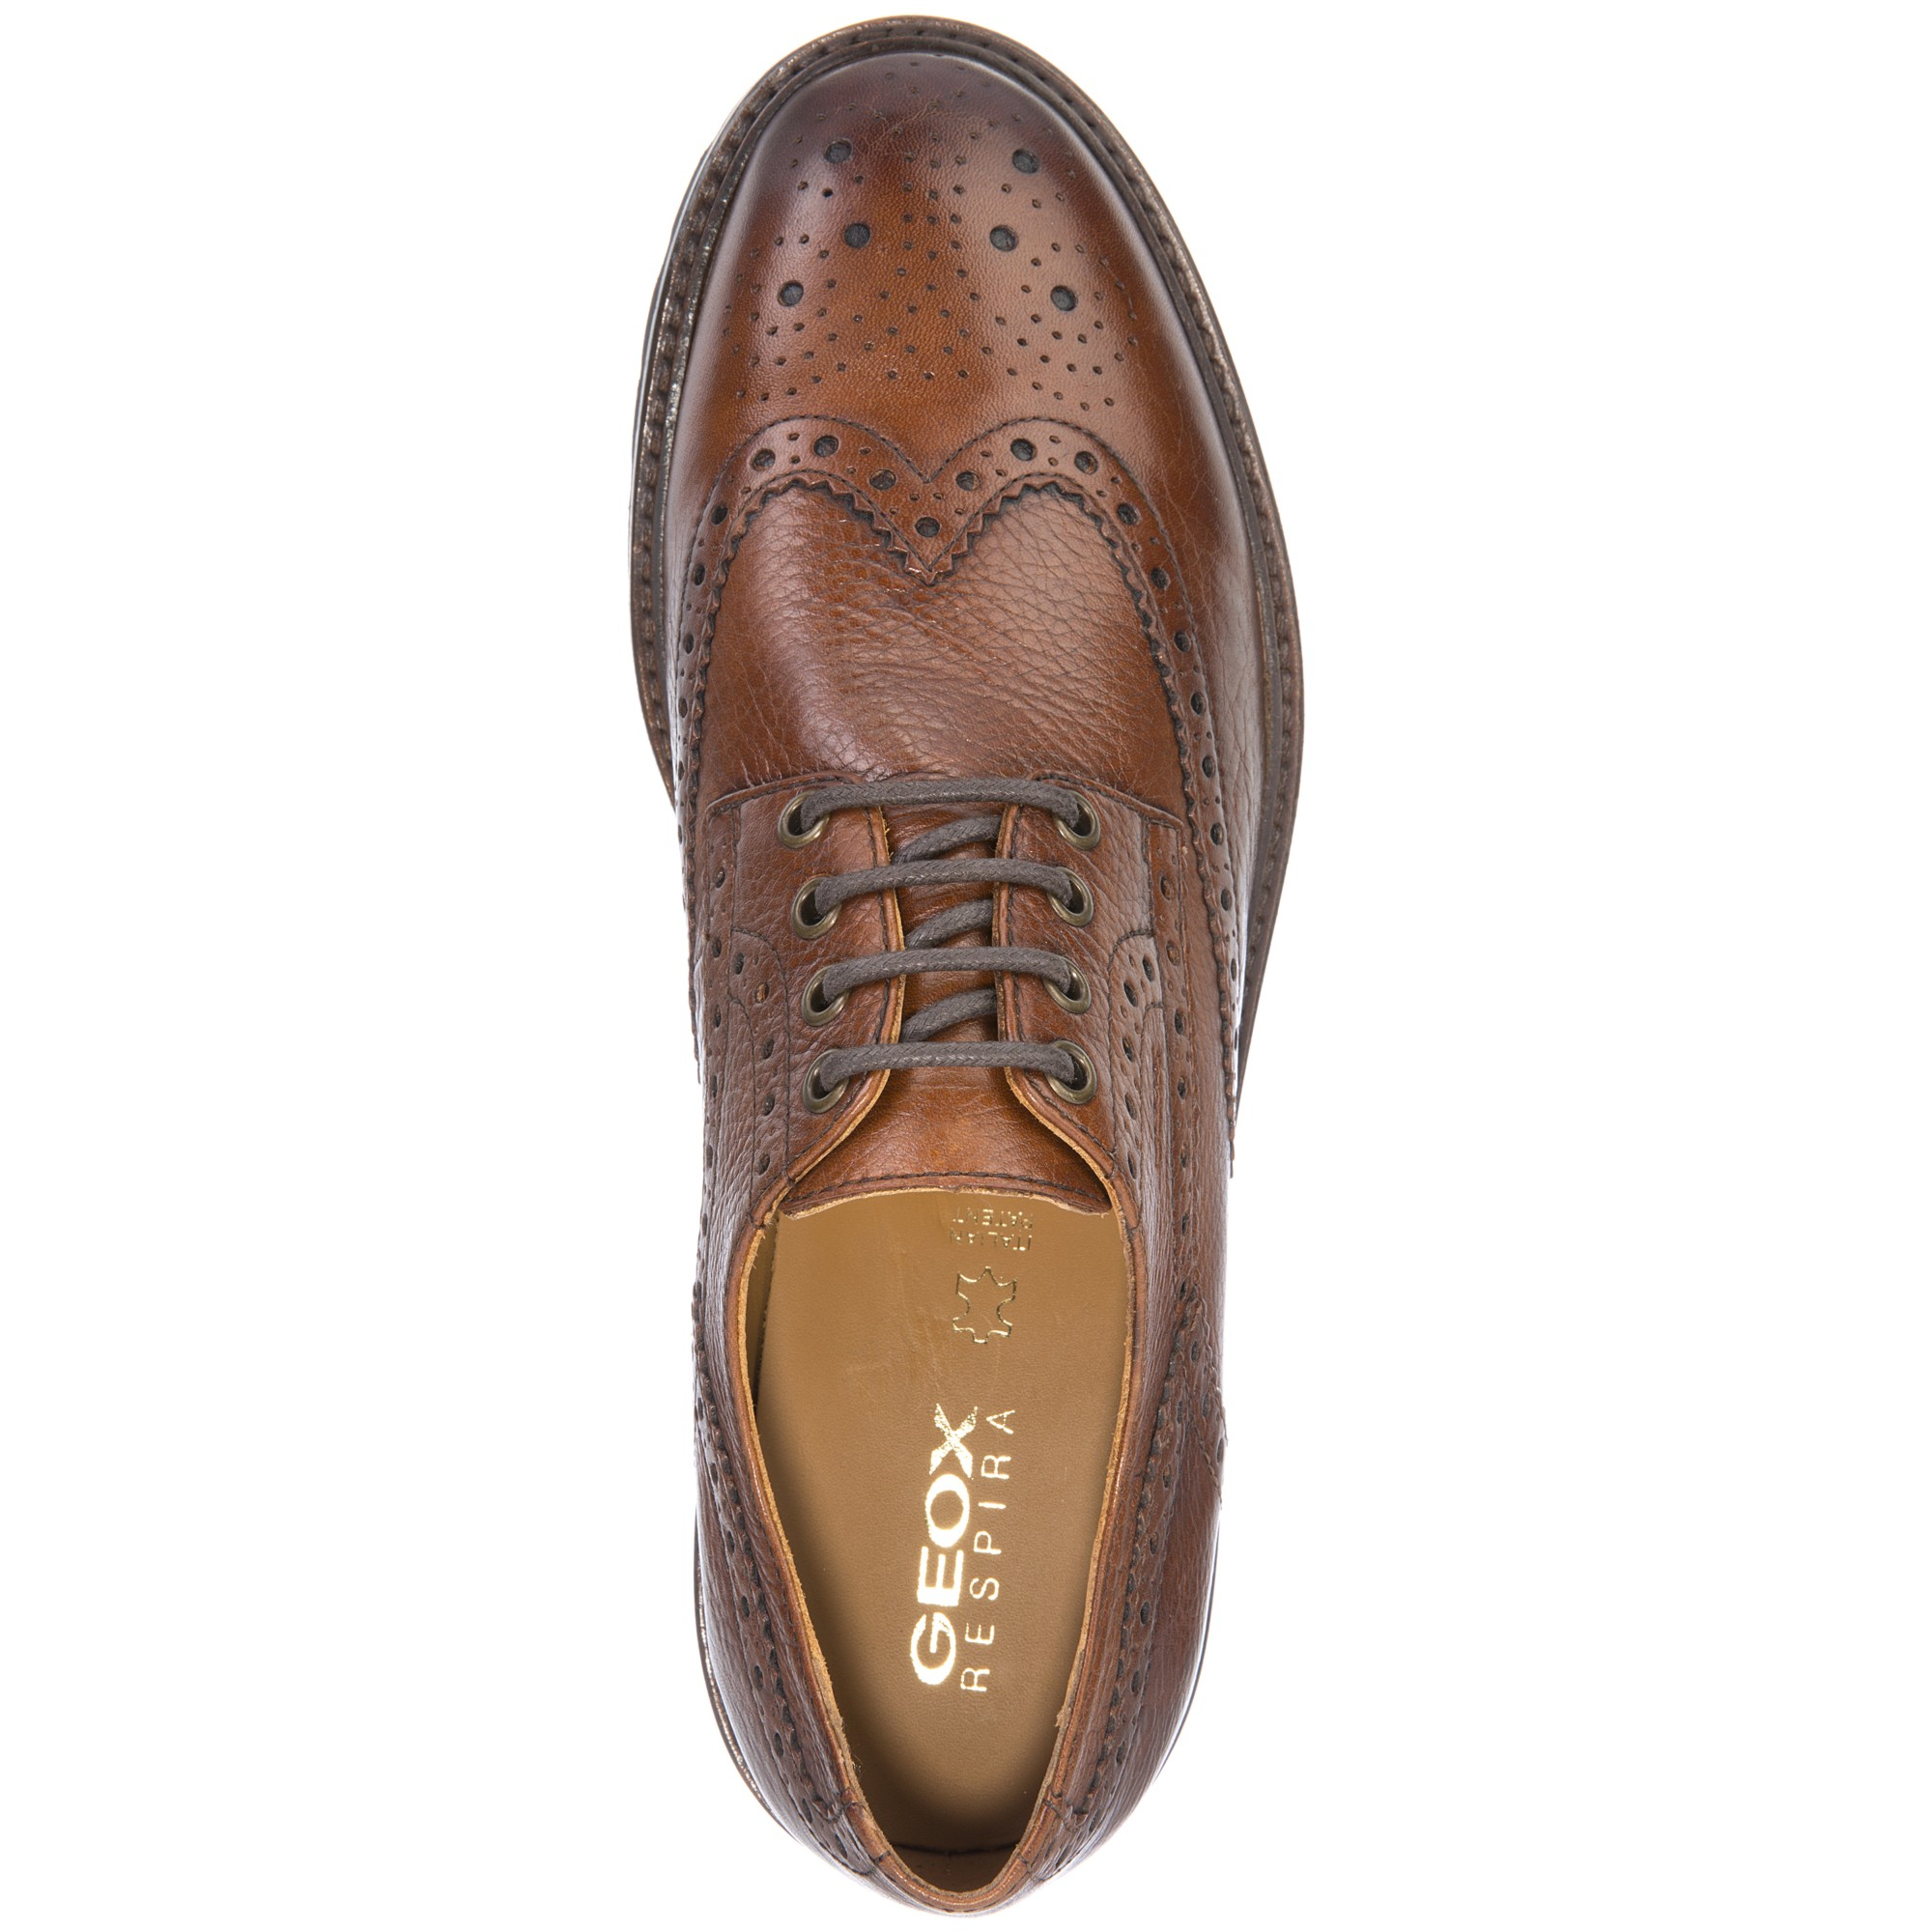 großes Sortiment Online-Einzelhändler am besten geliebt Igor Leather Brogue Shoes